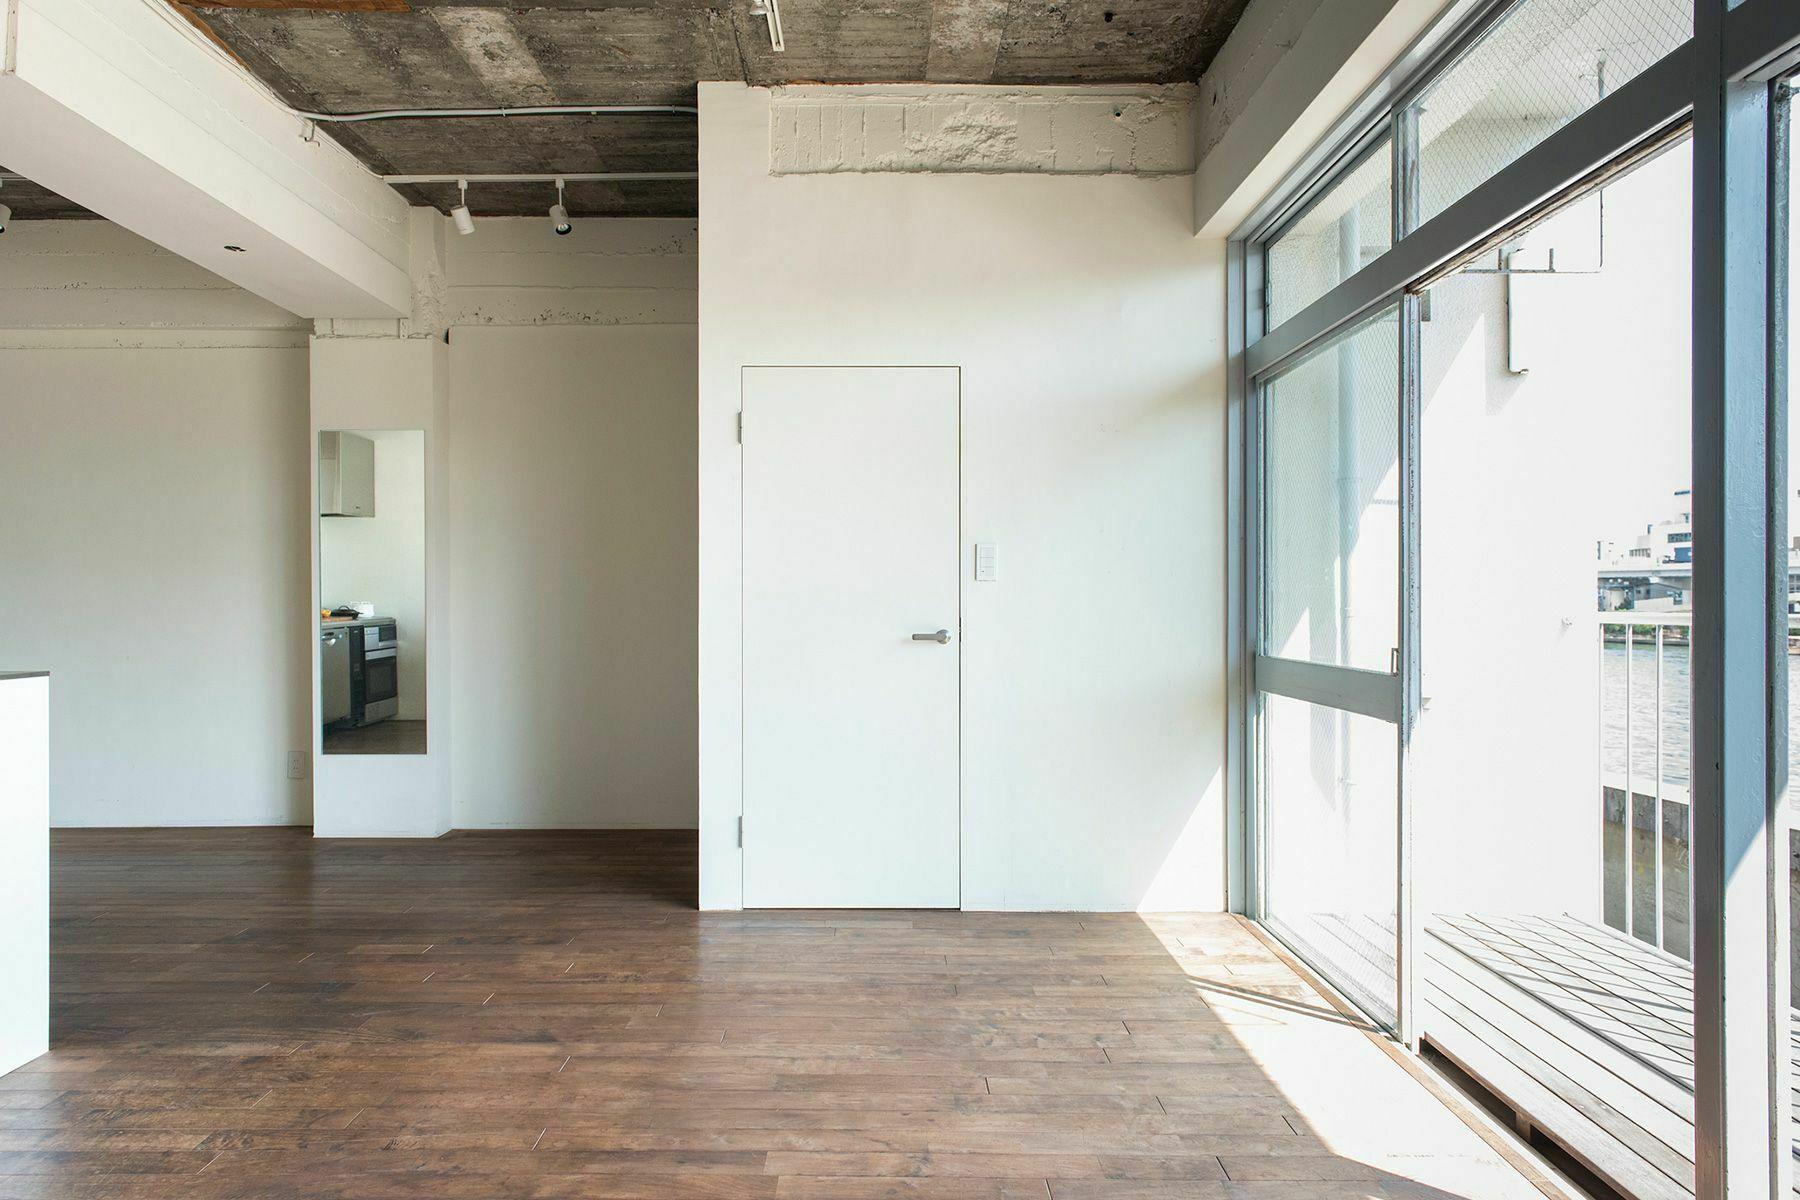 cobaco kitchen(コバコ キッチン)キッチン設備